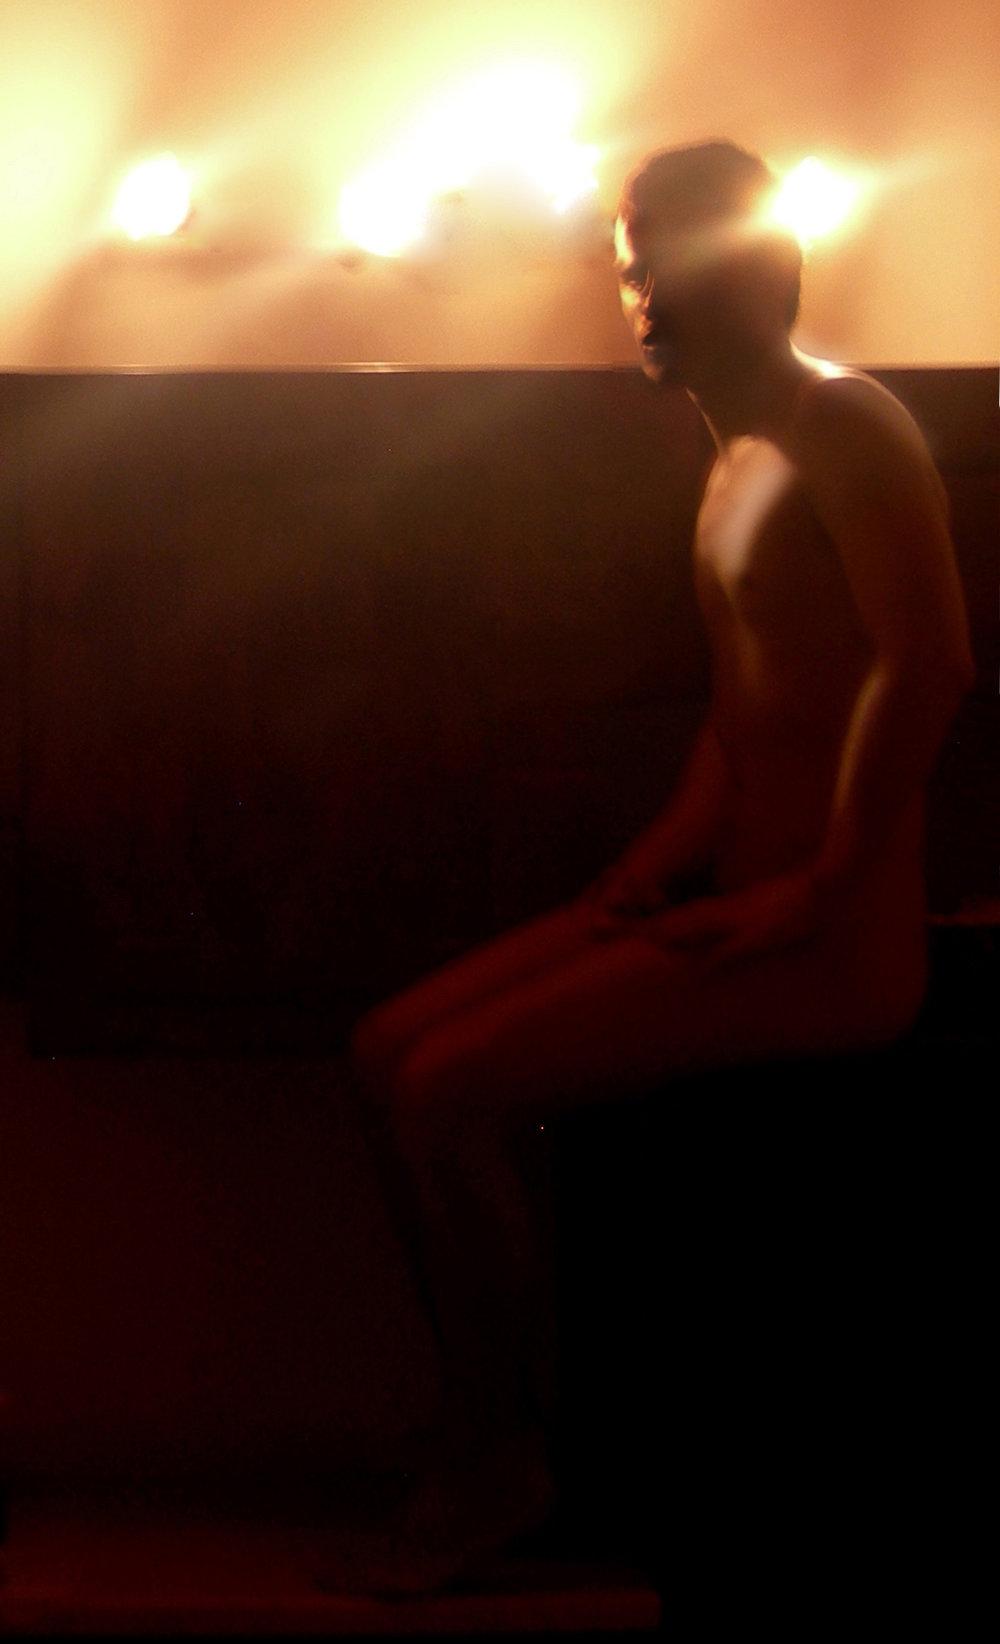 Johnny Abbate - Alien #8 - 2012